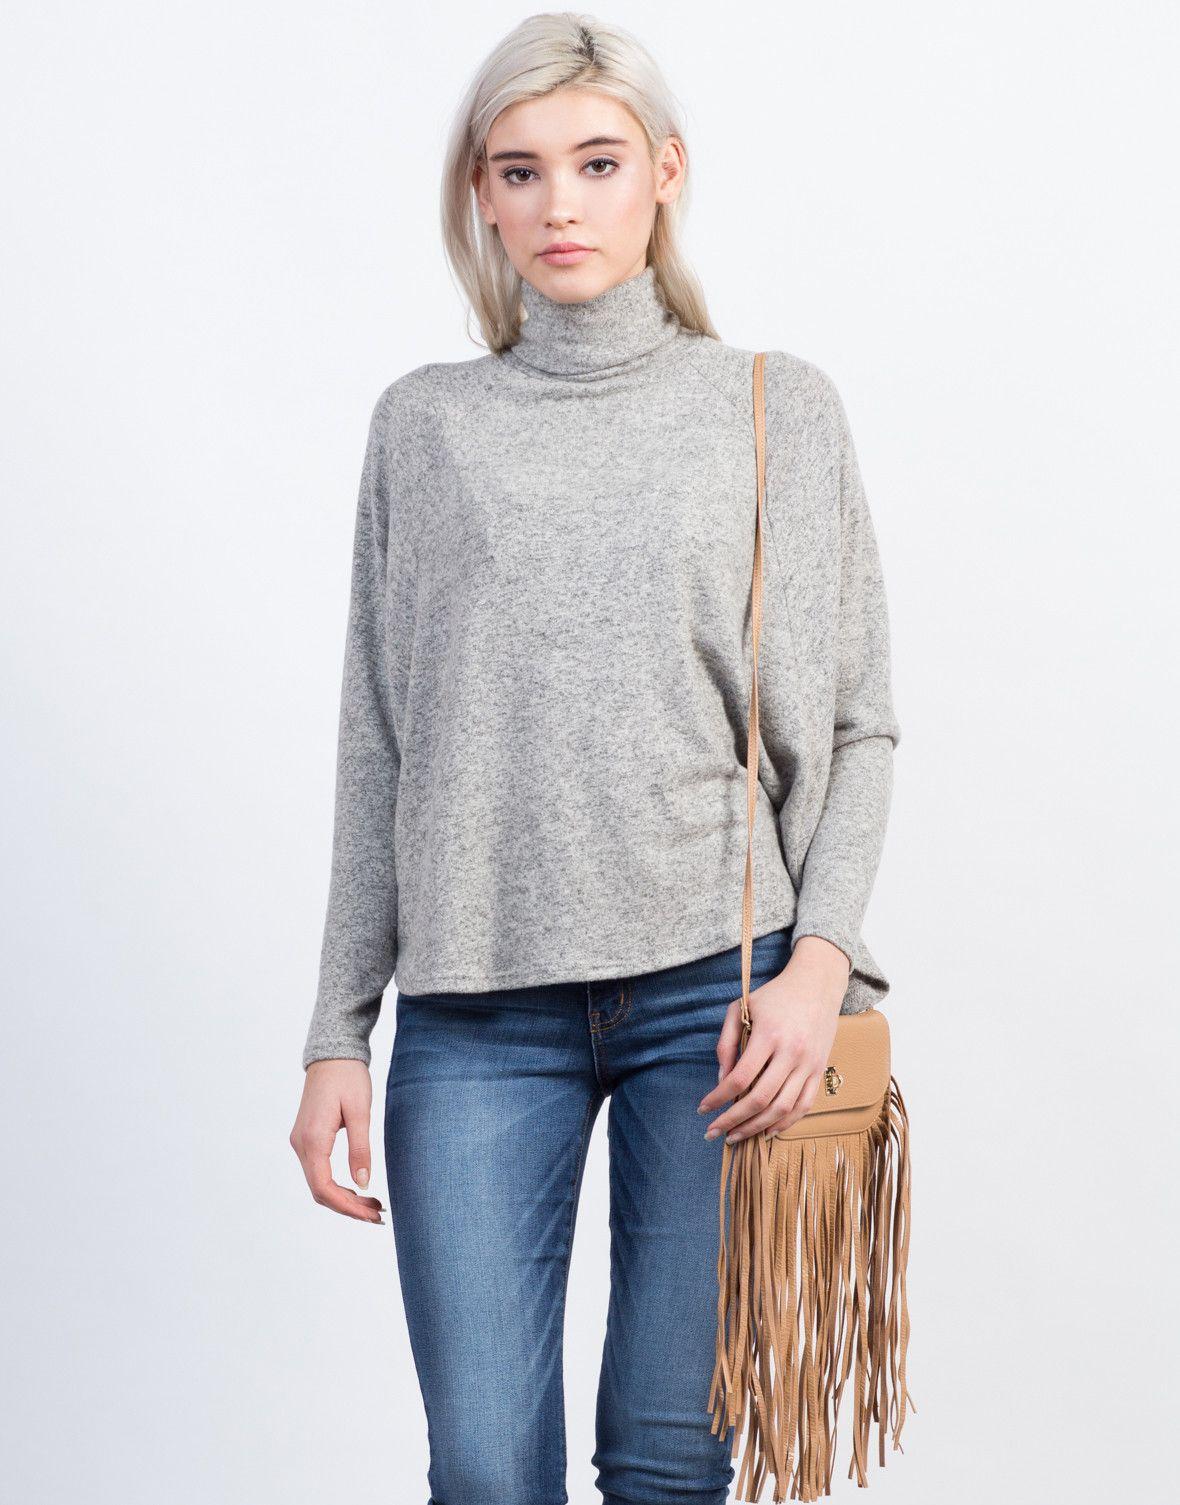 Flowy Turtleneck Top | ML - The Art Of Sweaters & Cardigans ...